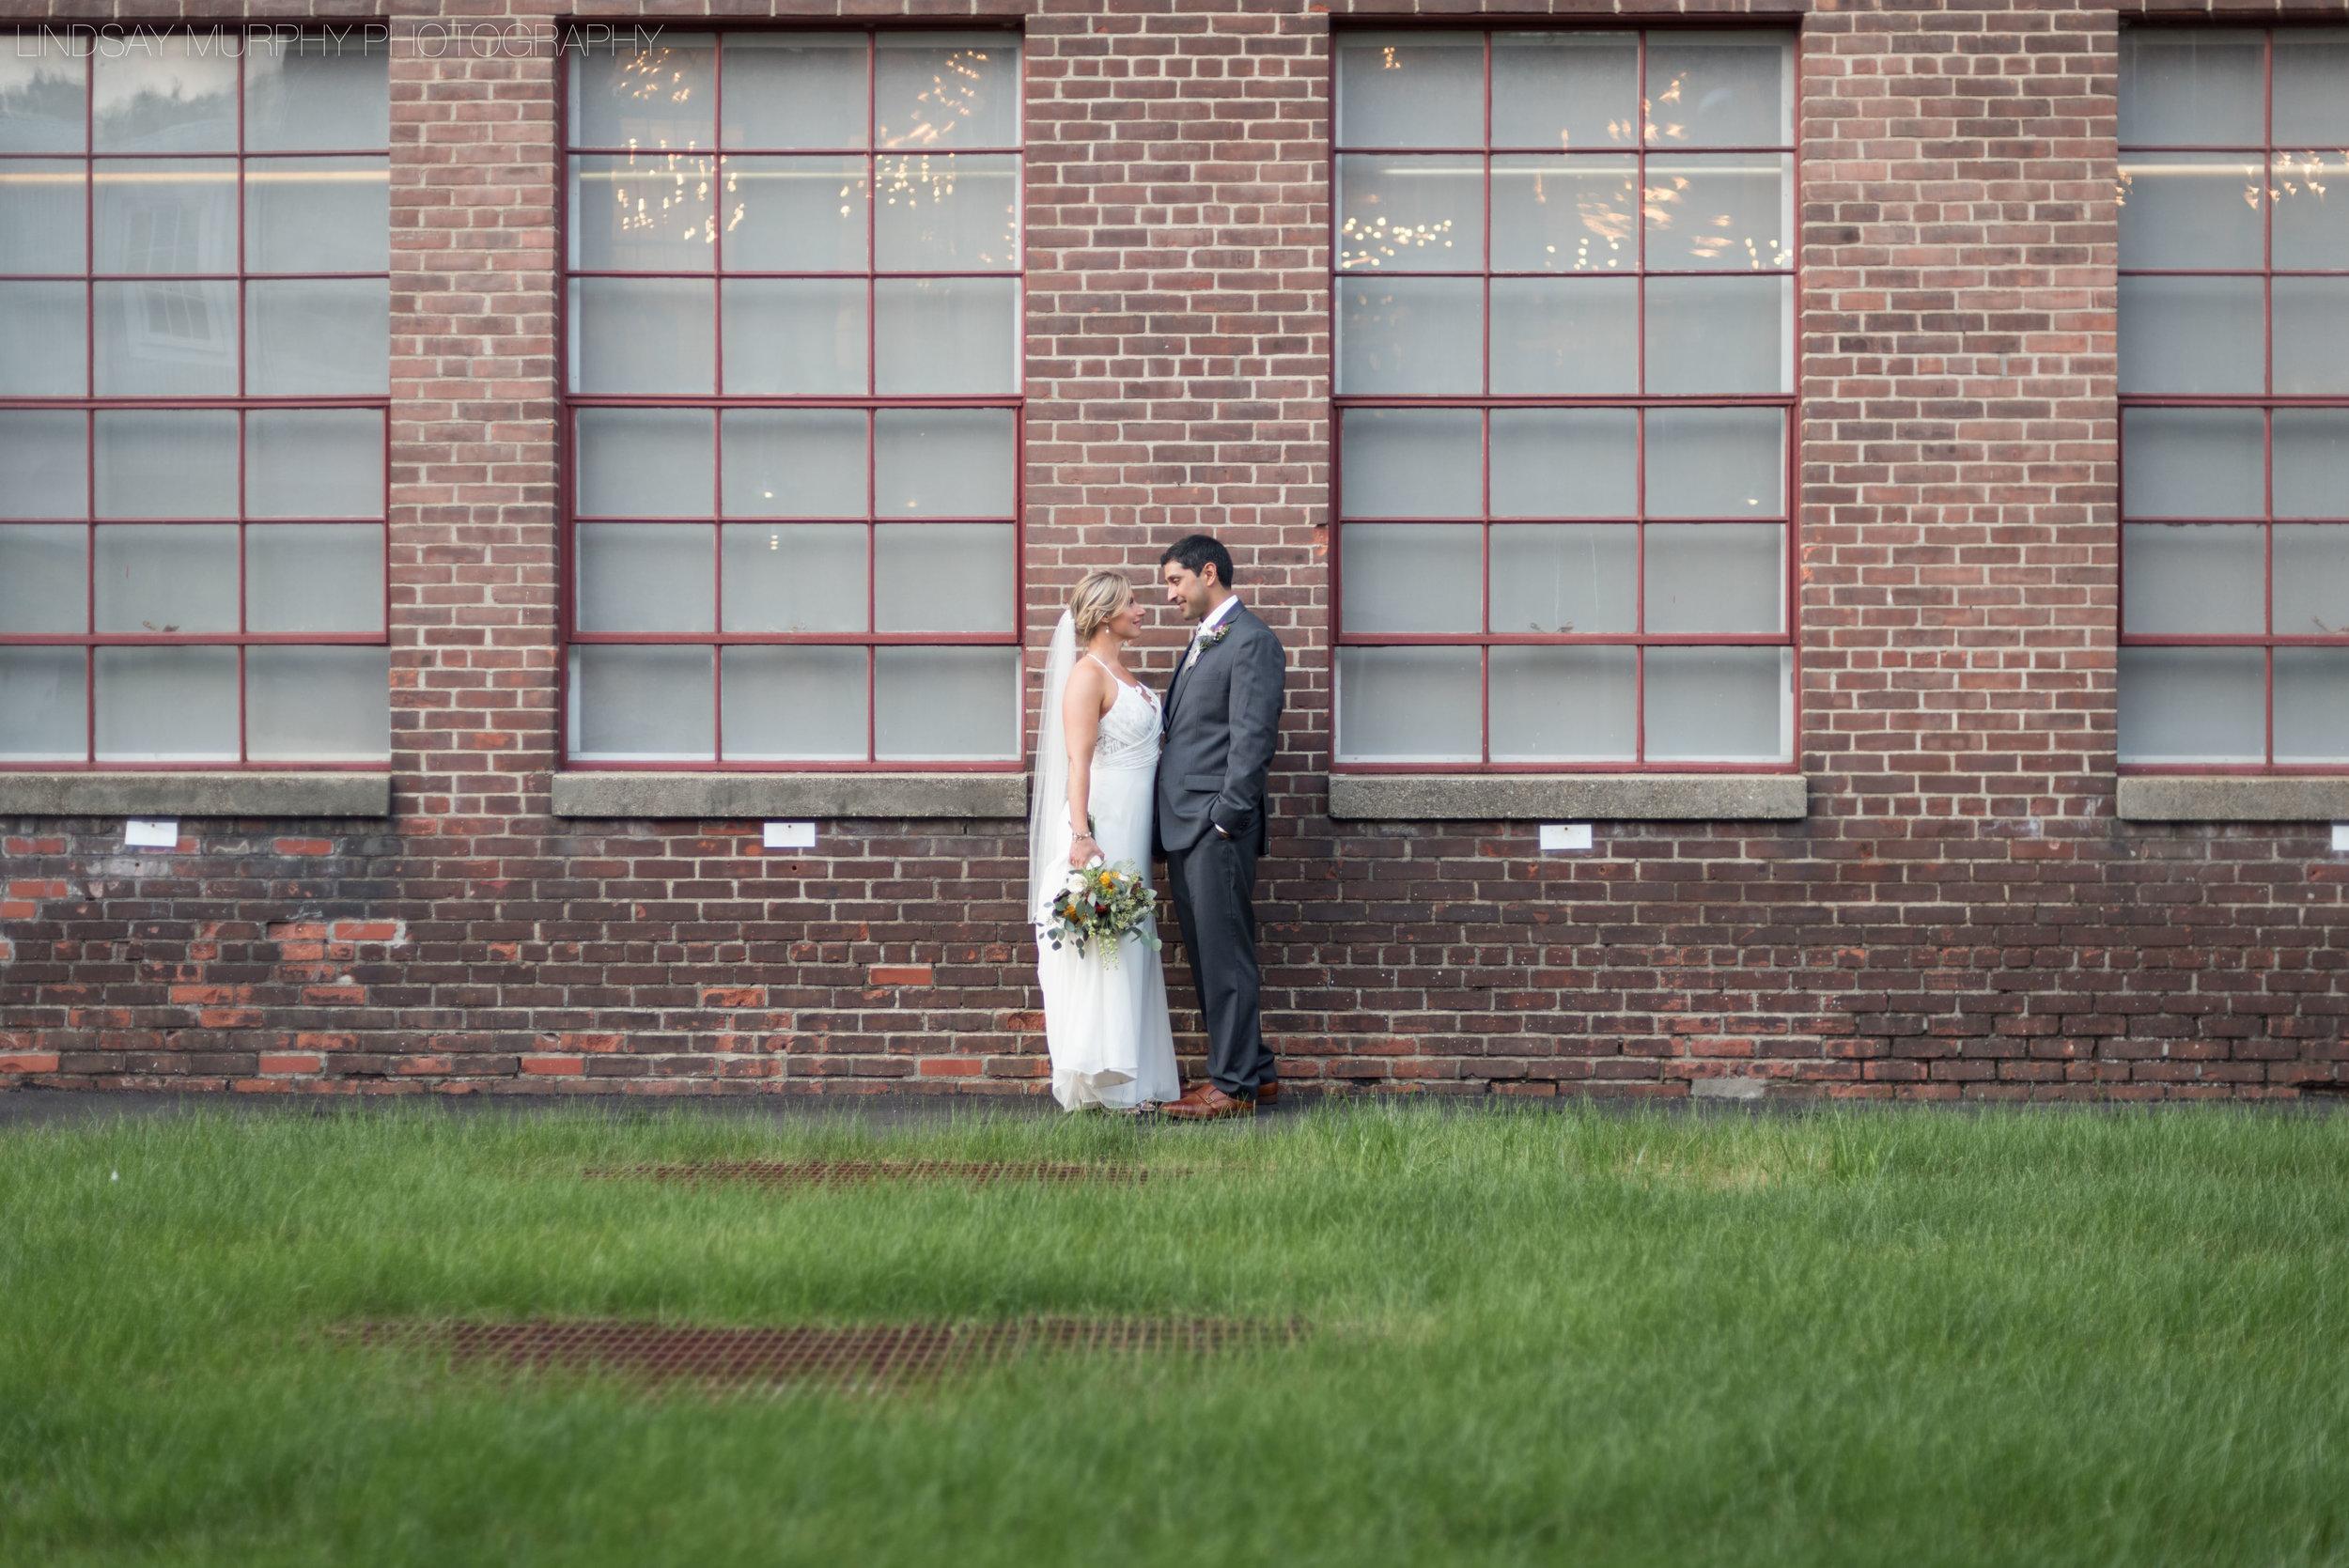 New_England_wedding-38.jpg